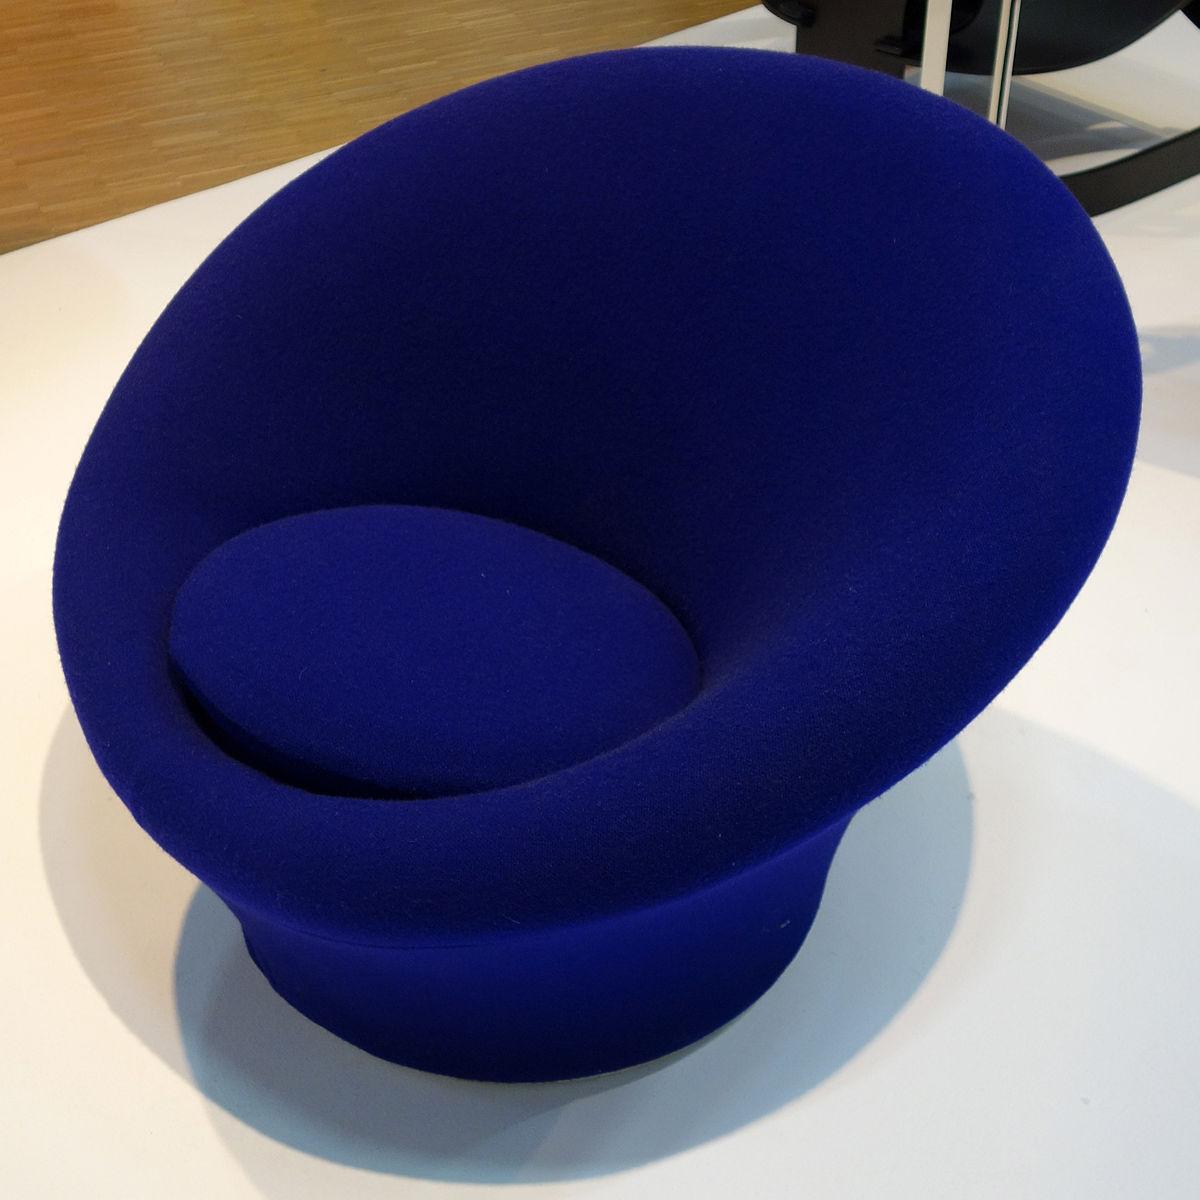 pierre paulin wikipedia. Black Bedroom Furniture Sets. Home Design Ideas